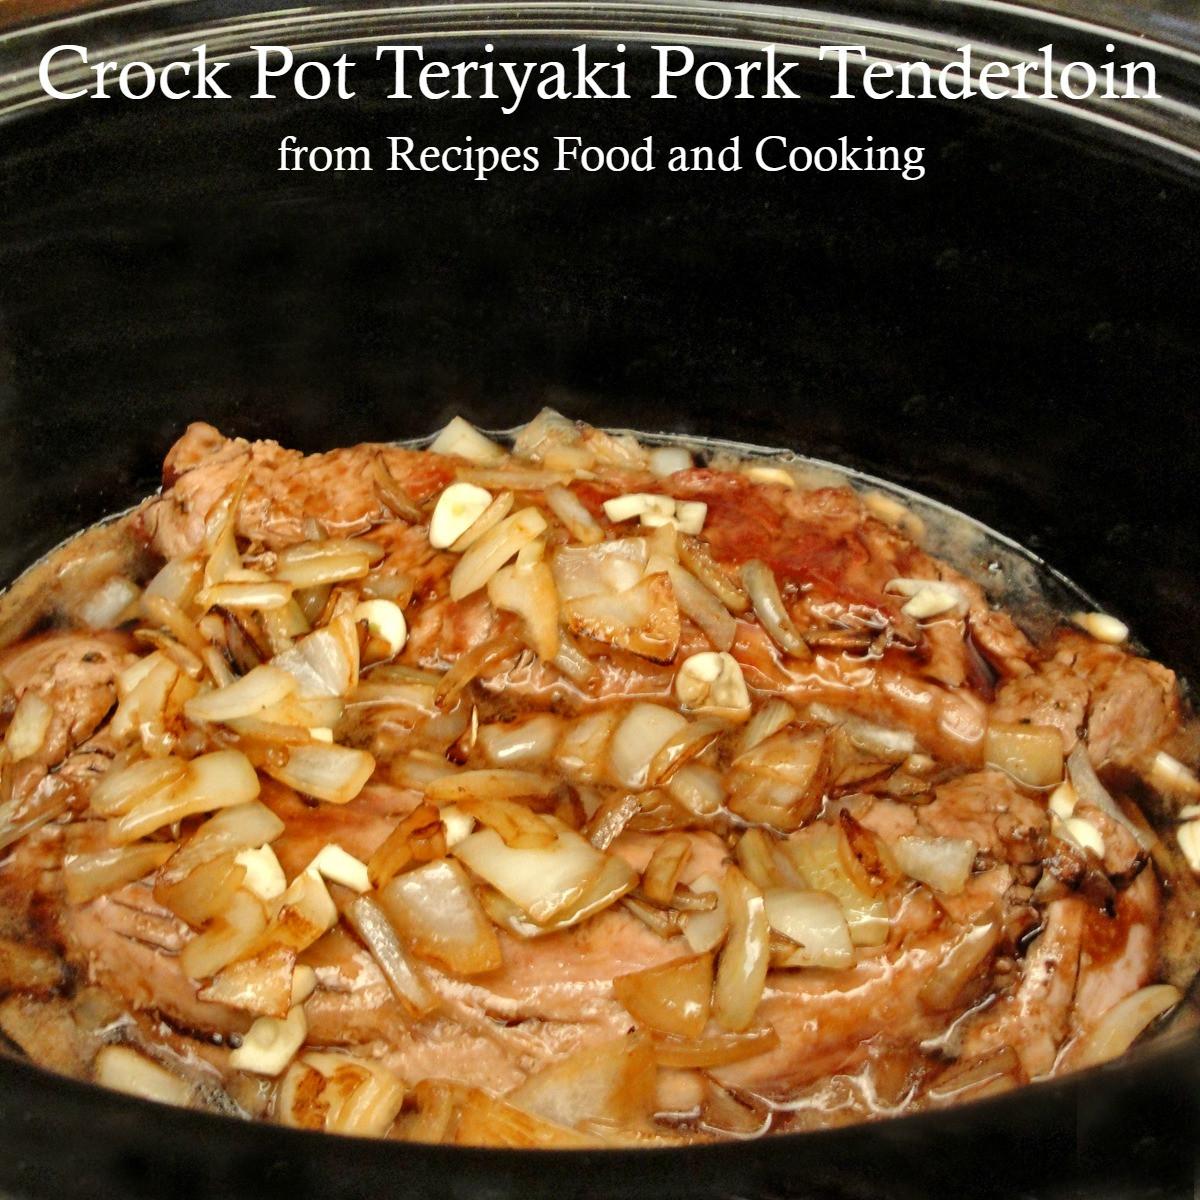 Pork Tenderloin In Crock Pot  Crock Pot Teriyaki Pork Tenderloin Recipes Food and Cooking